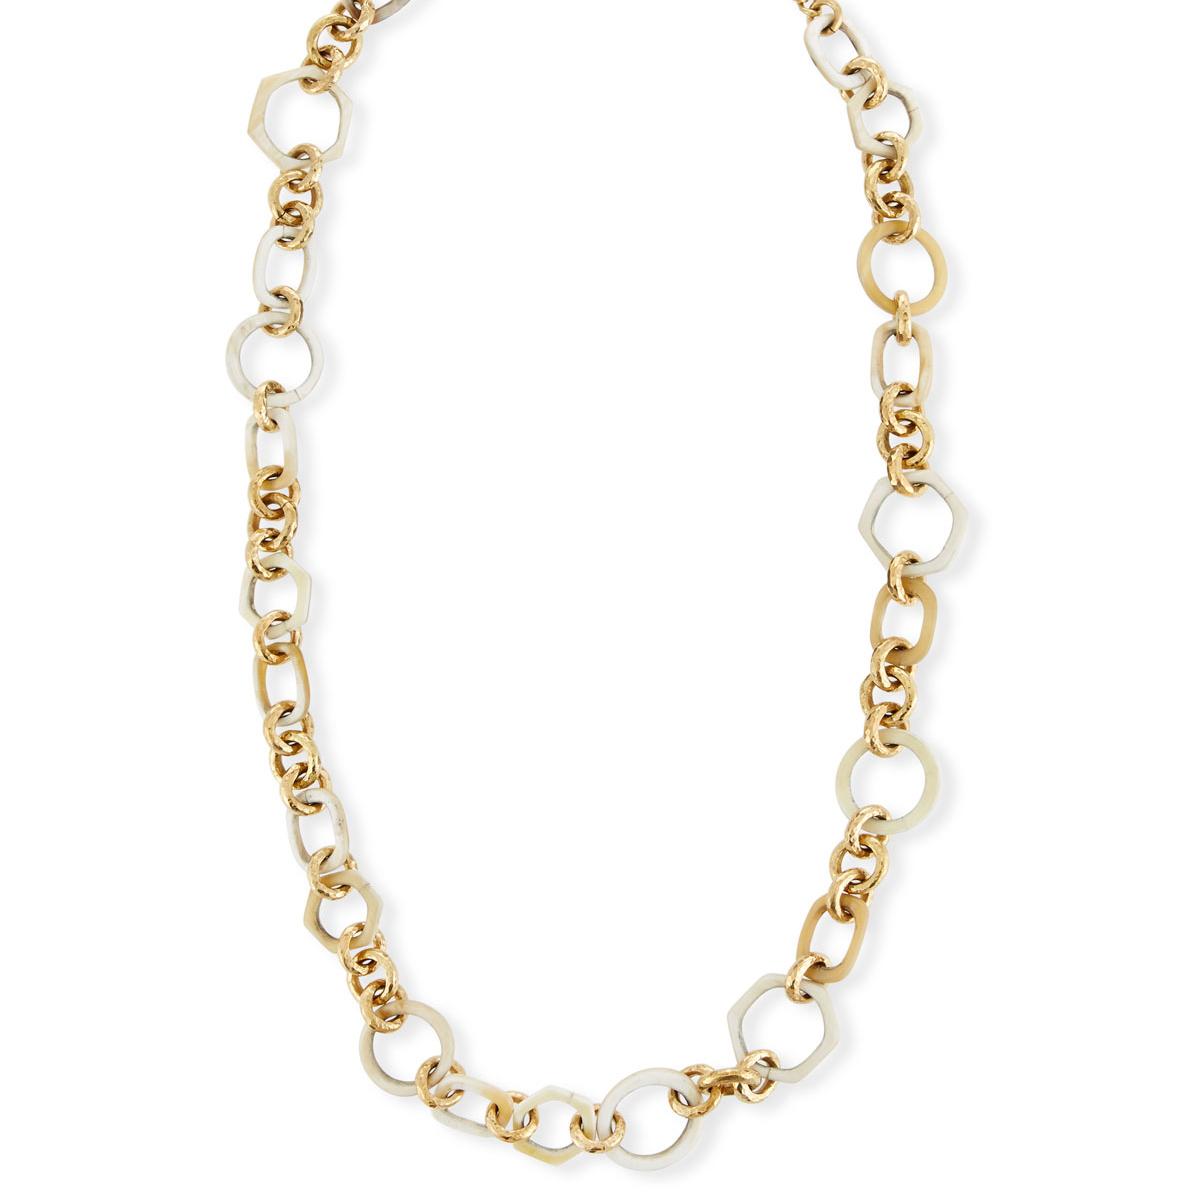 ashley pittman light horn necklace.jpg